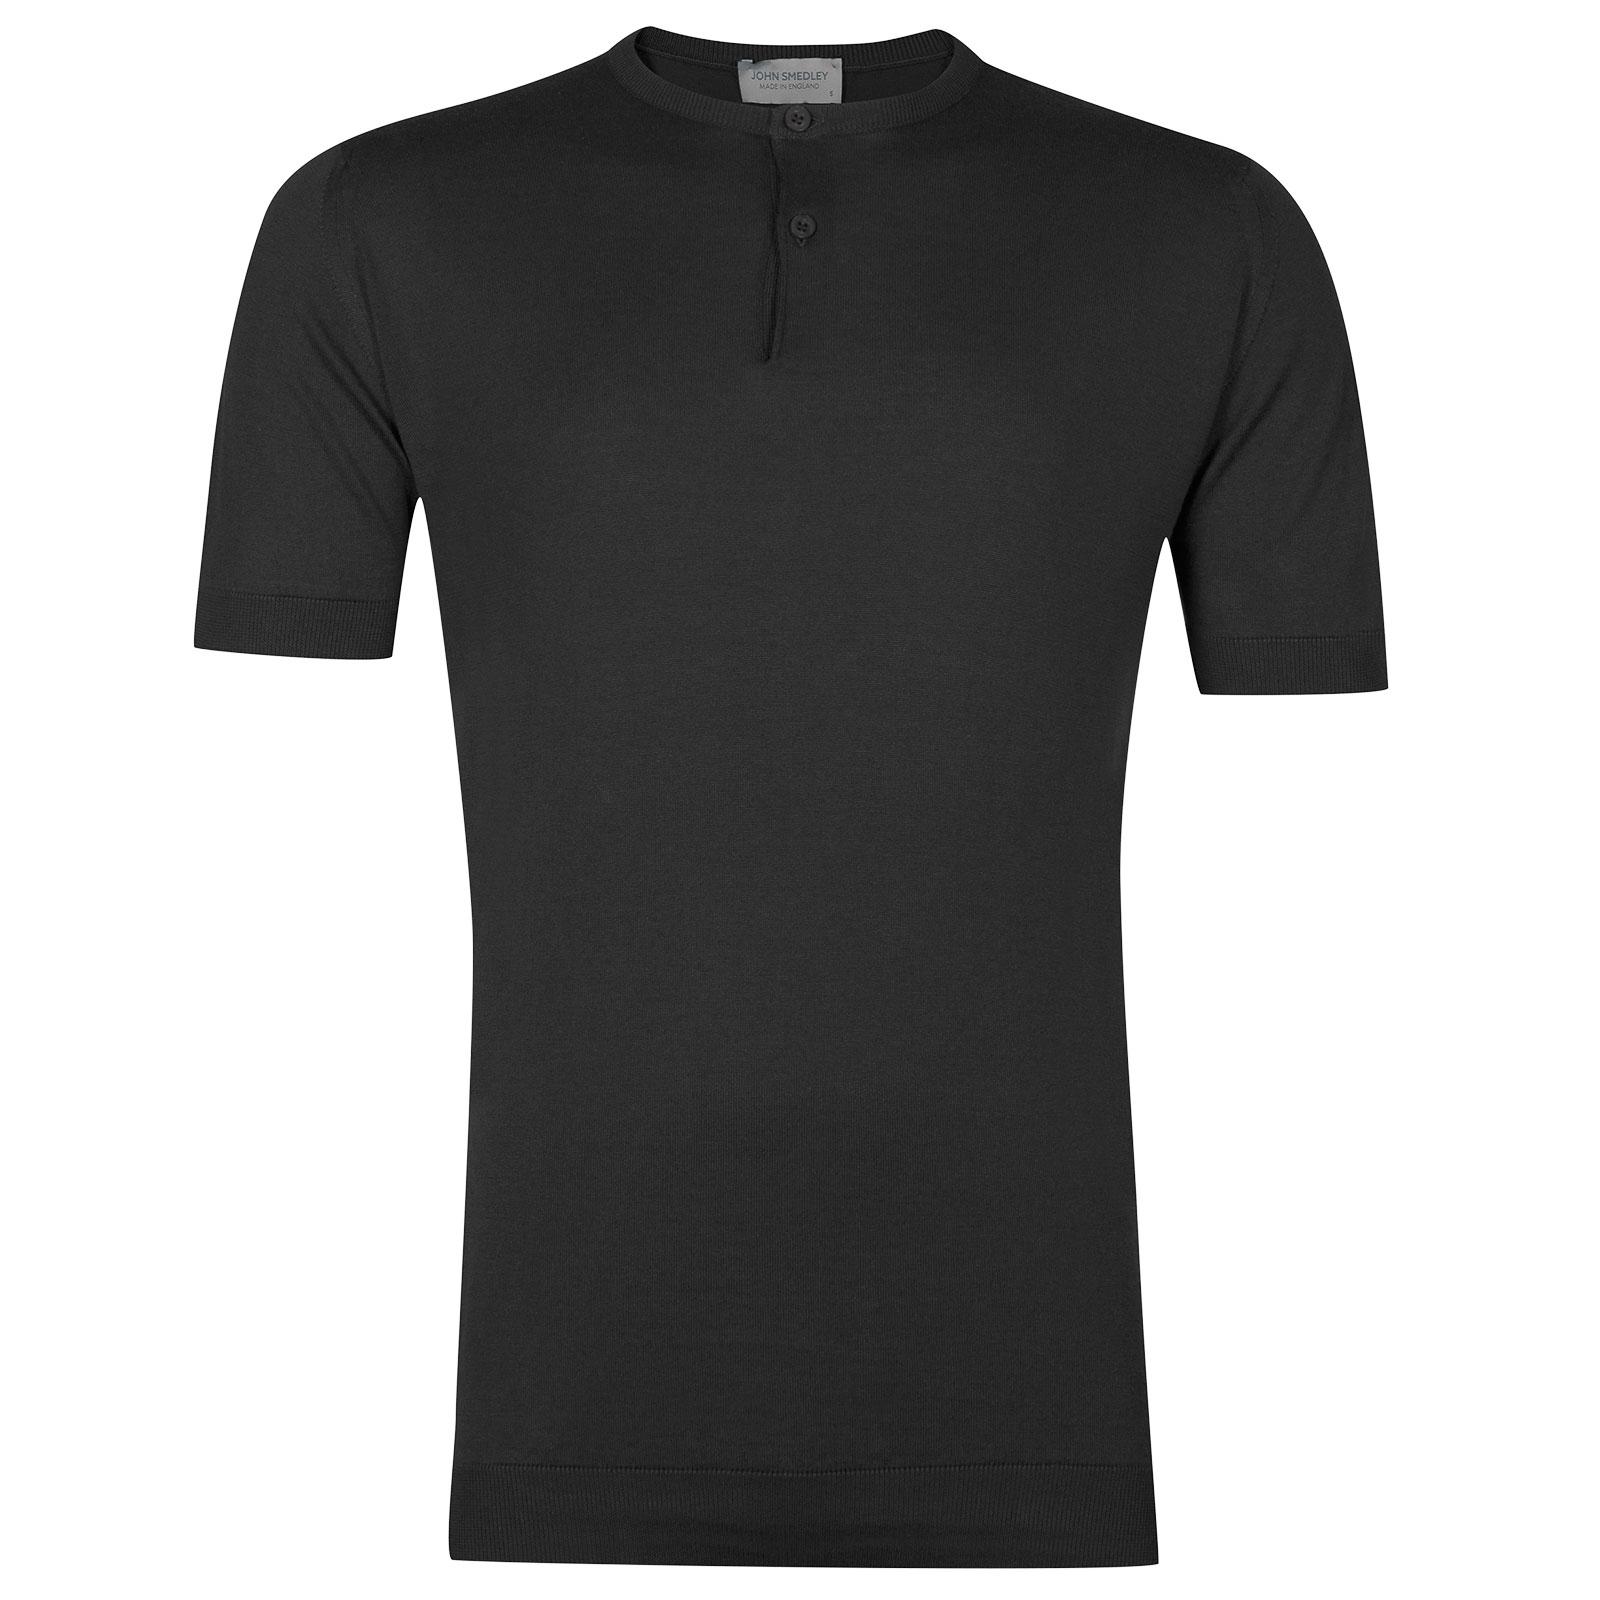 John Smedley Bennett in Flannel Grey T-Shirt-XXL